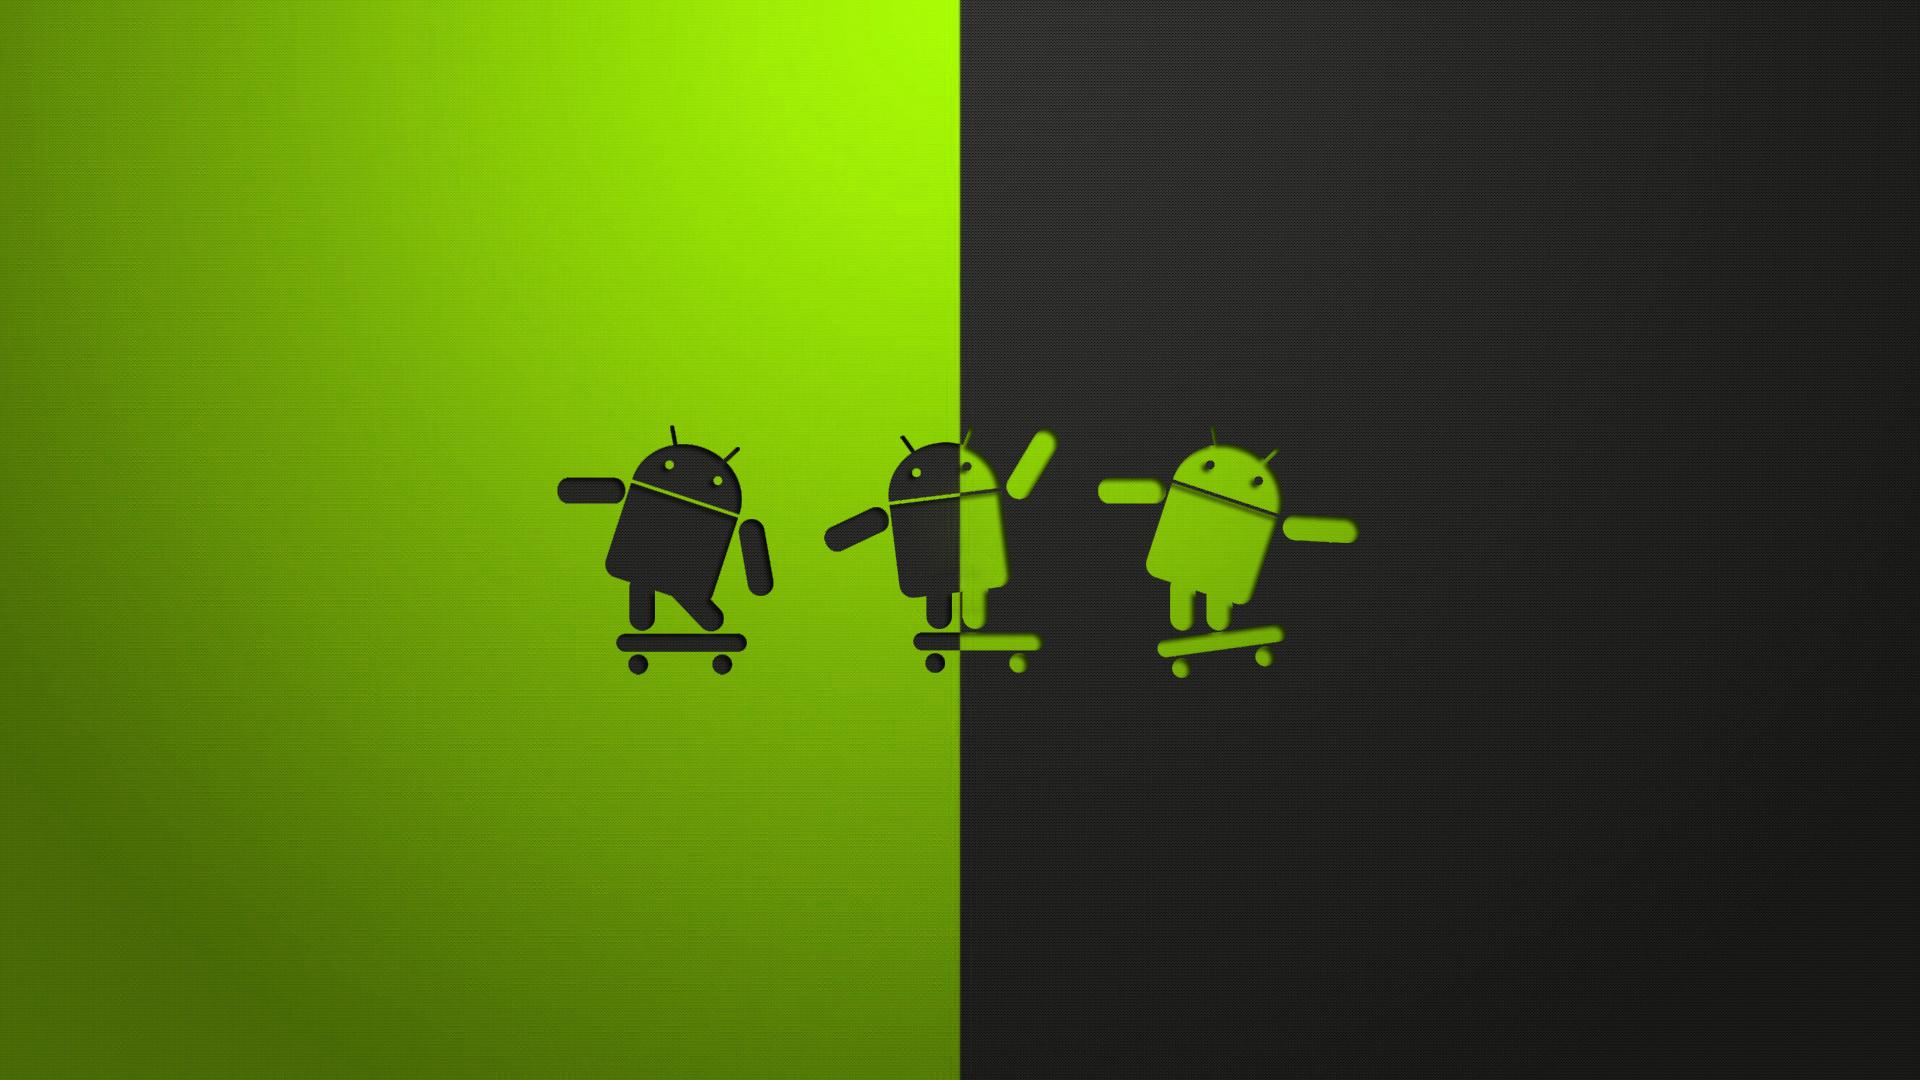 Cool Android Wallpaper 1614 1920 x 1080   WallpaperLayercom 1920x1080